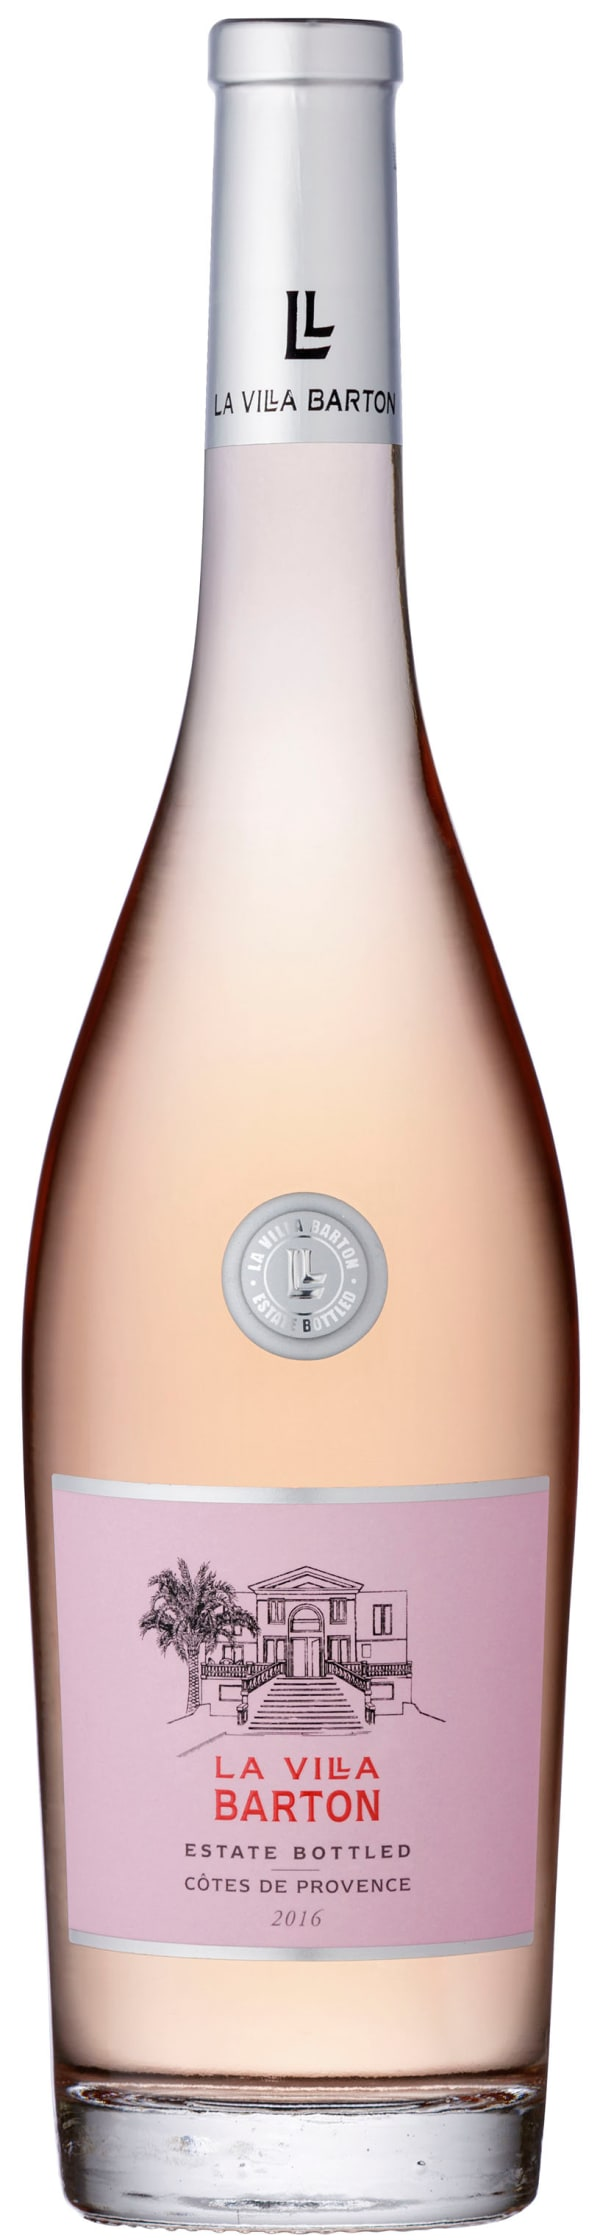 La Villa Barton Estate Bottled Rosé 2016